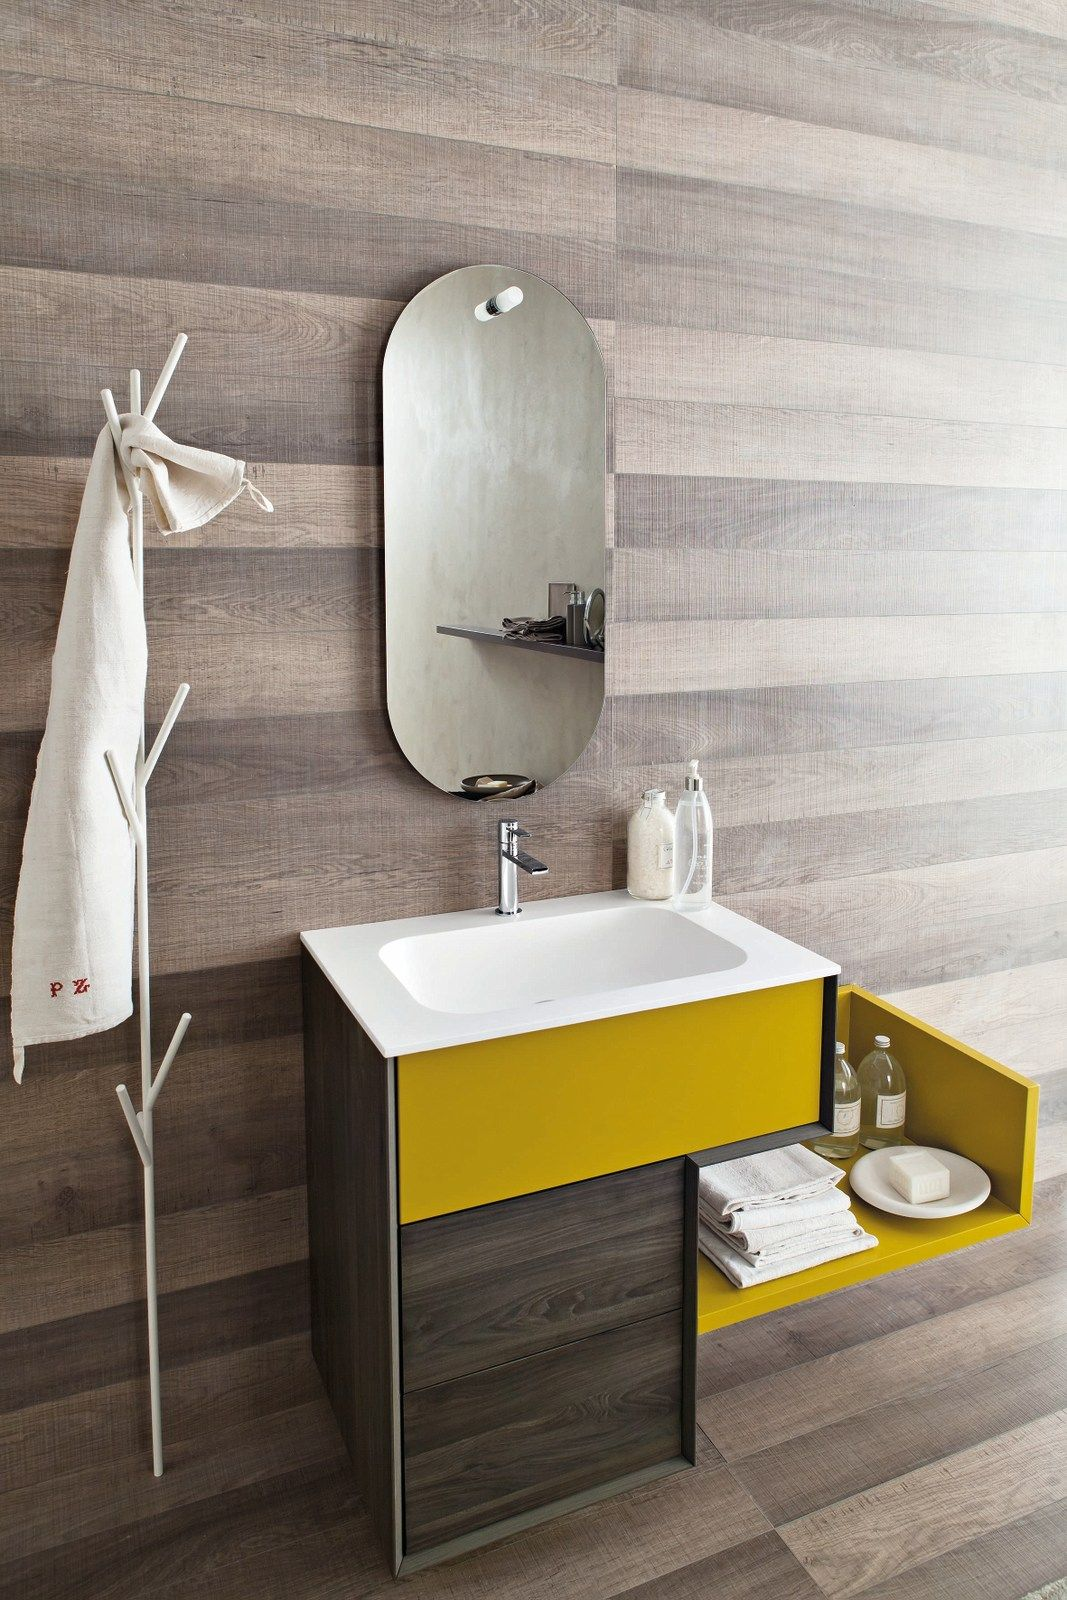 Single Hpl Vanity Unit With Mirror Libera 3d Composition L09 By Novello Design Gian Vittorio Plazzo Stylish Bathroom Bathroom Design Modern Luxury Interior